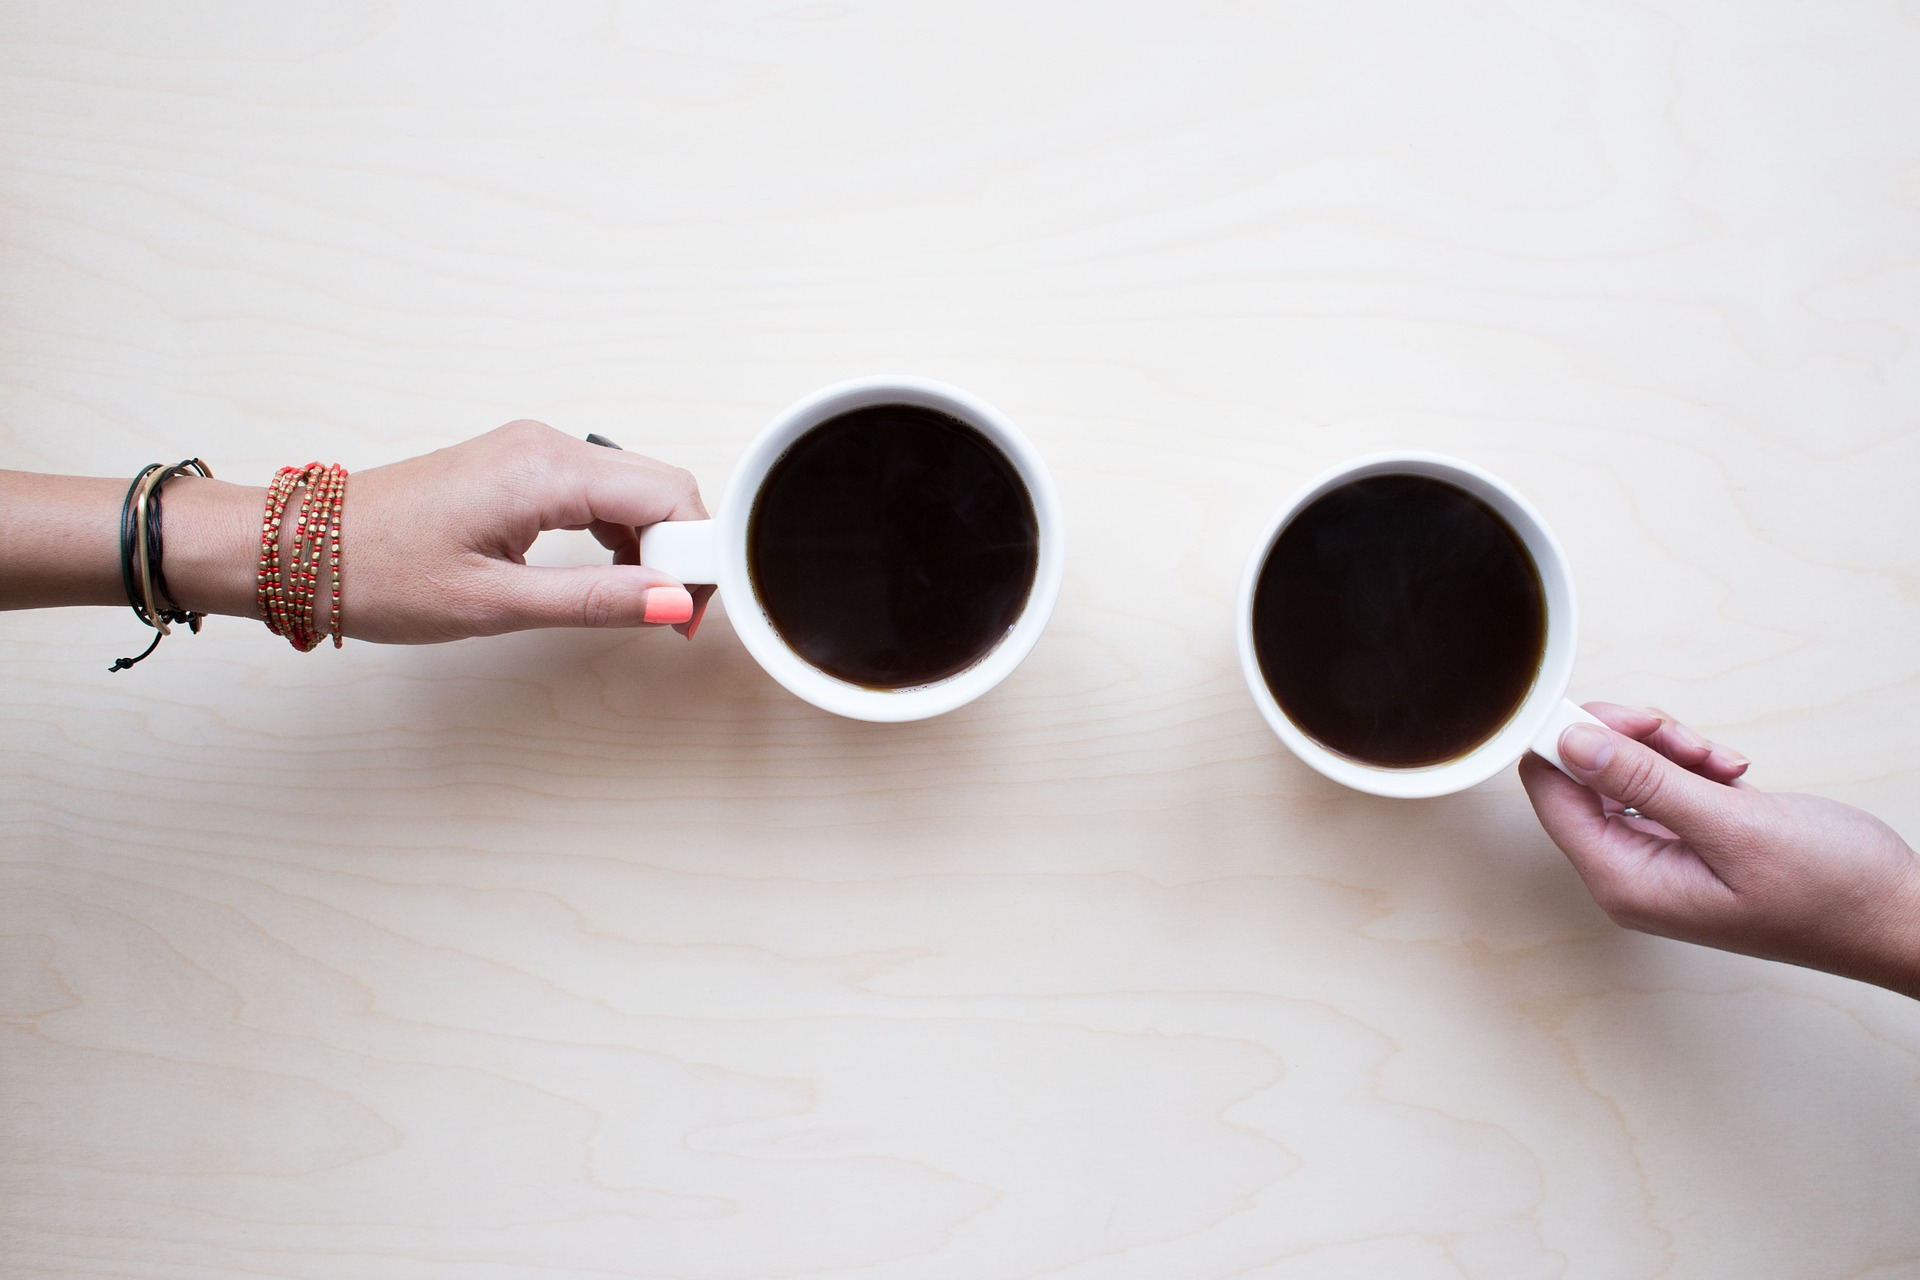 LET'S GET COFFEE & TALK GROWTH - THEMASSAGEMILLIONAIRE@GMAIL.COM